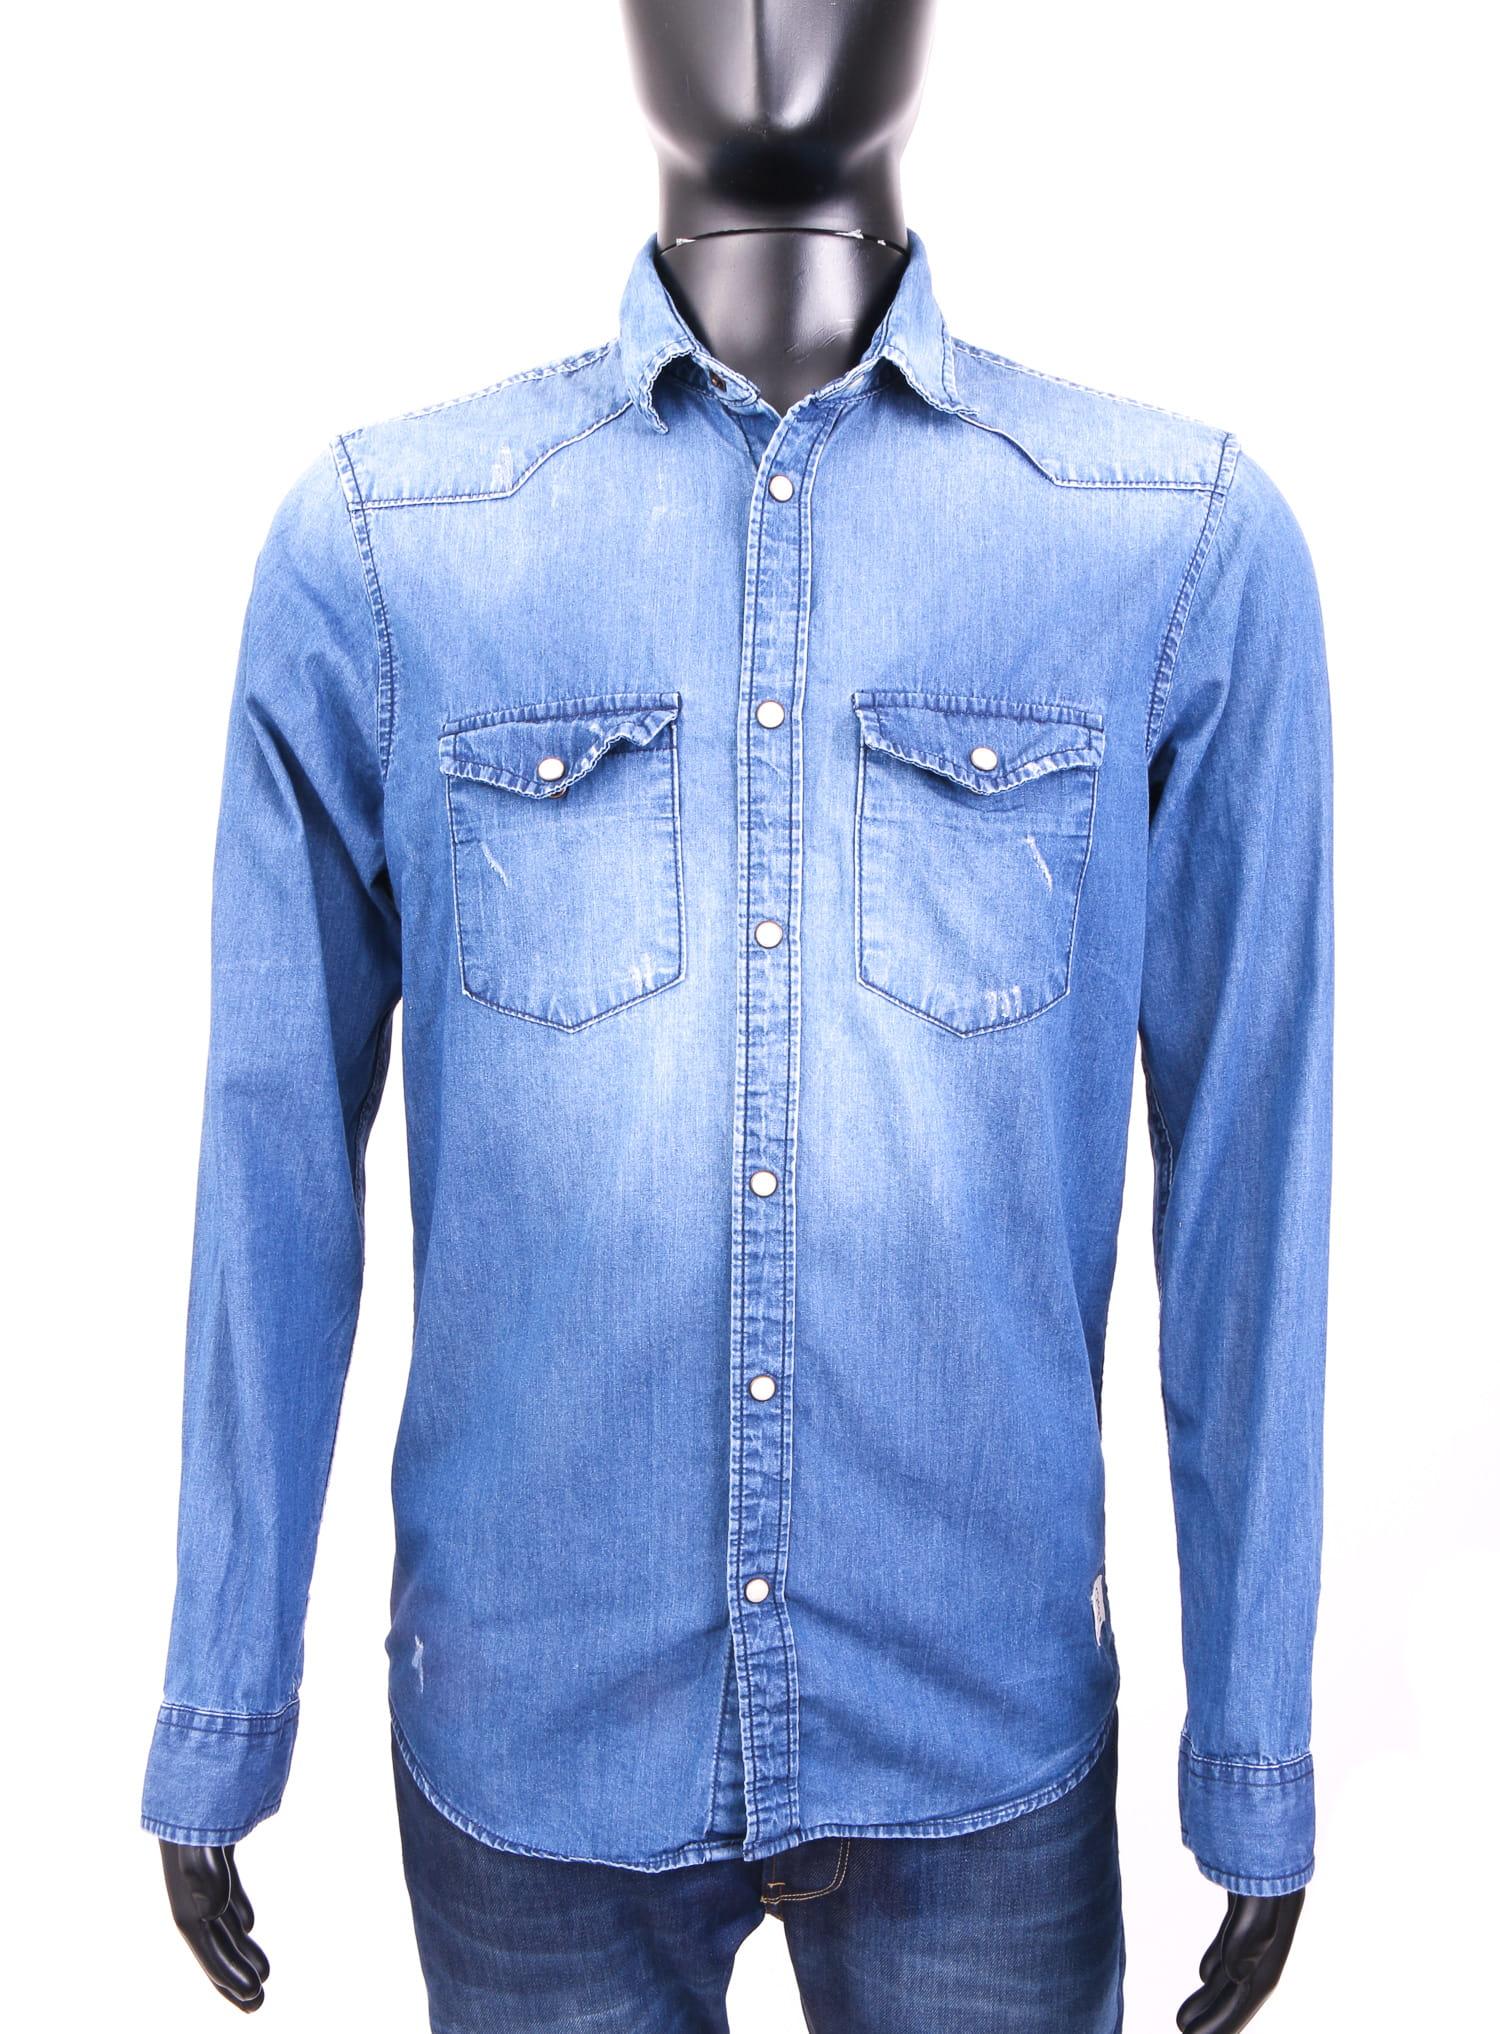 6bc04ad66f Details about Jack Jones Mens Shirt Jeans Tailored Blue size S